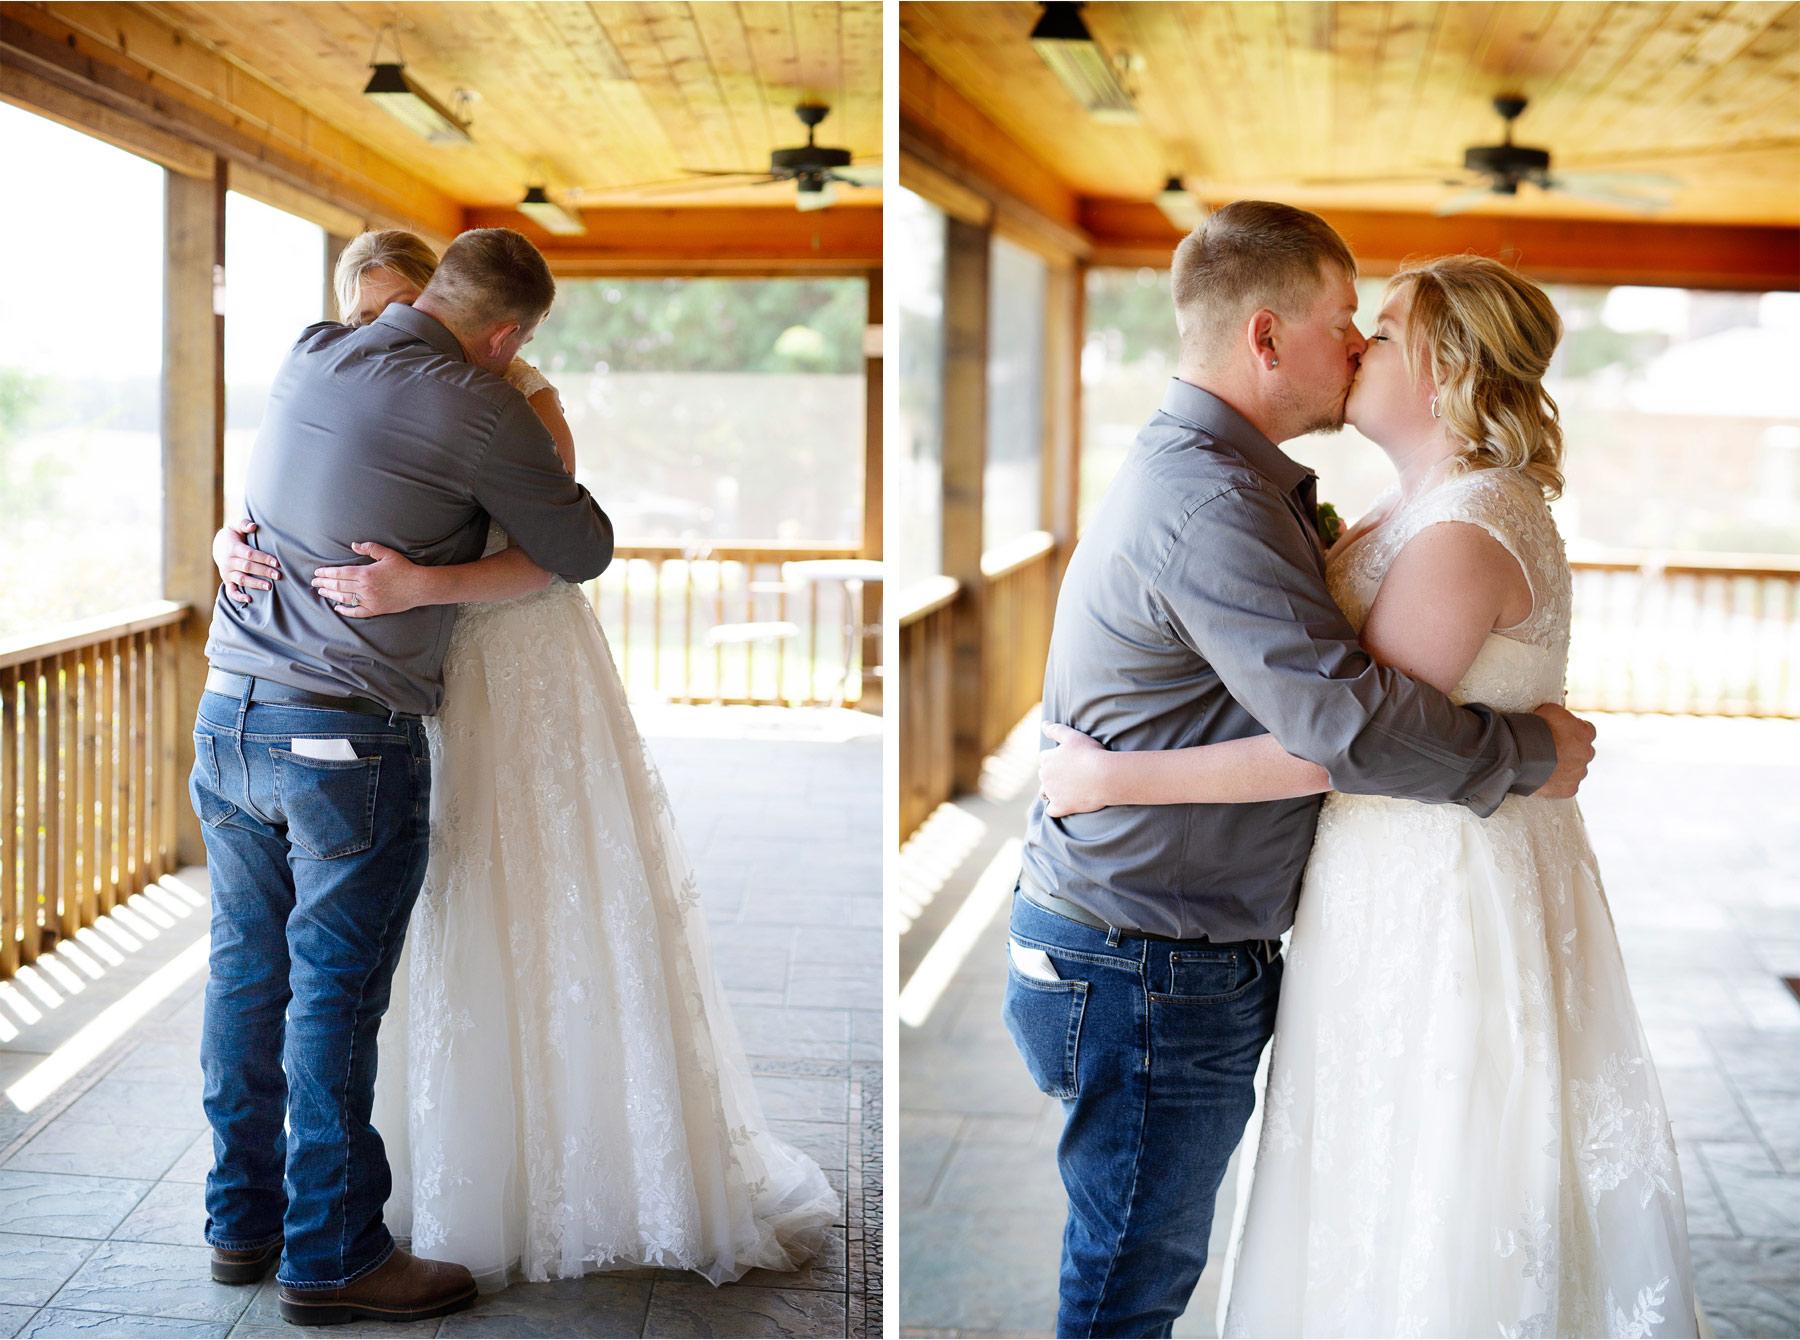 02-Vick-Photography-Wedding-Brainerd-Minnesota-Pine-Peaks-Lodge-Cabin-Rustic-Bride-Groom-Kristi-and-Noel.jpg